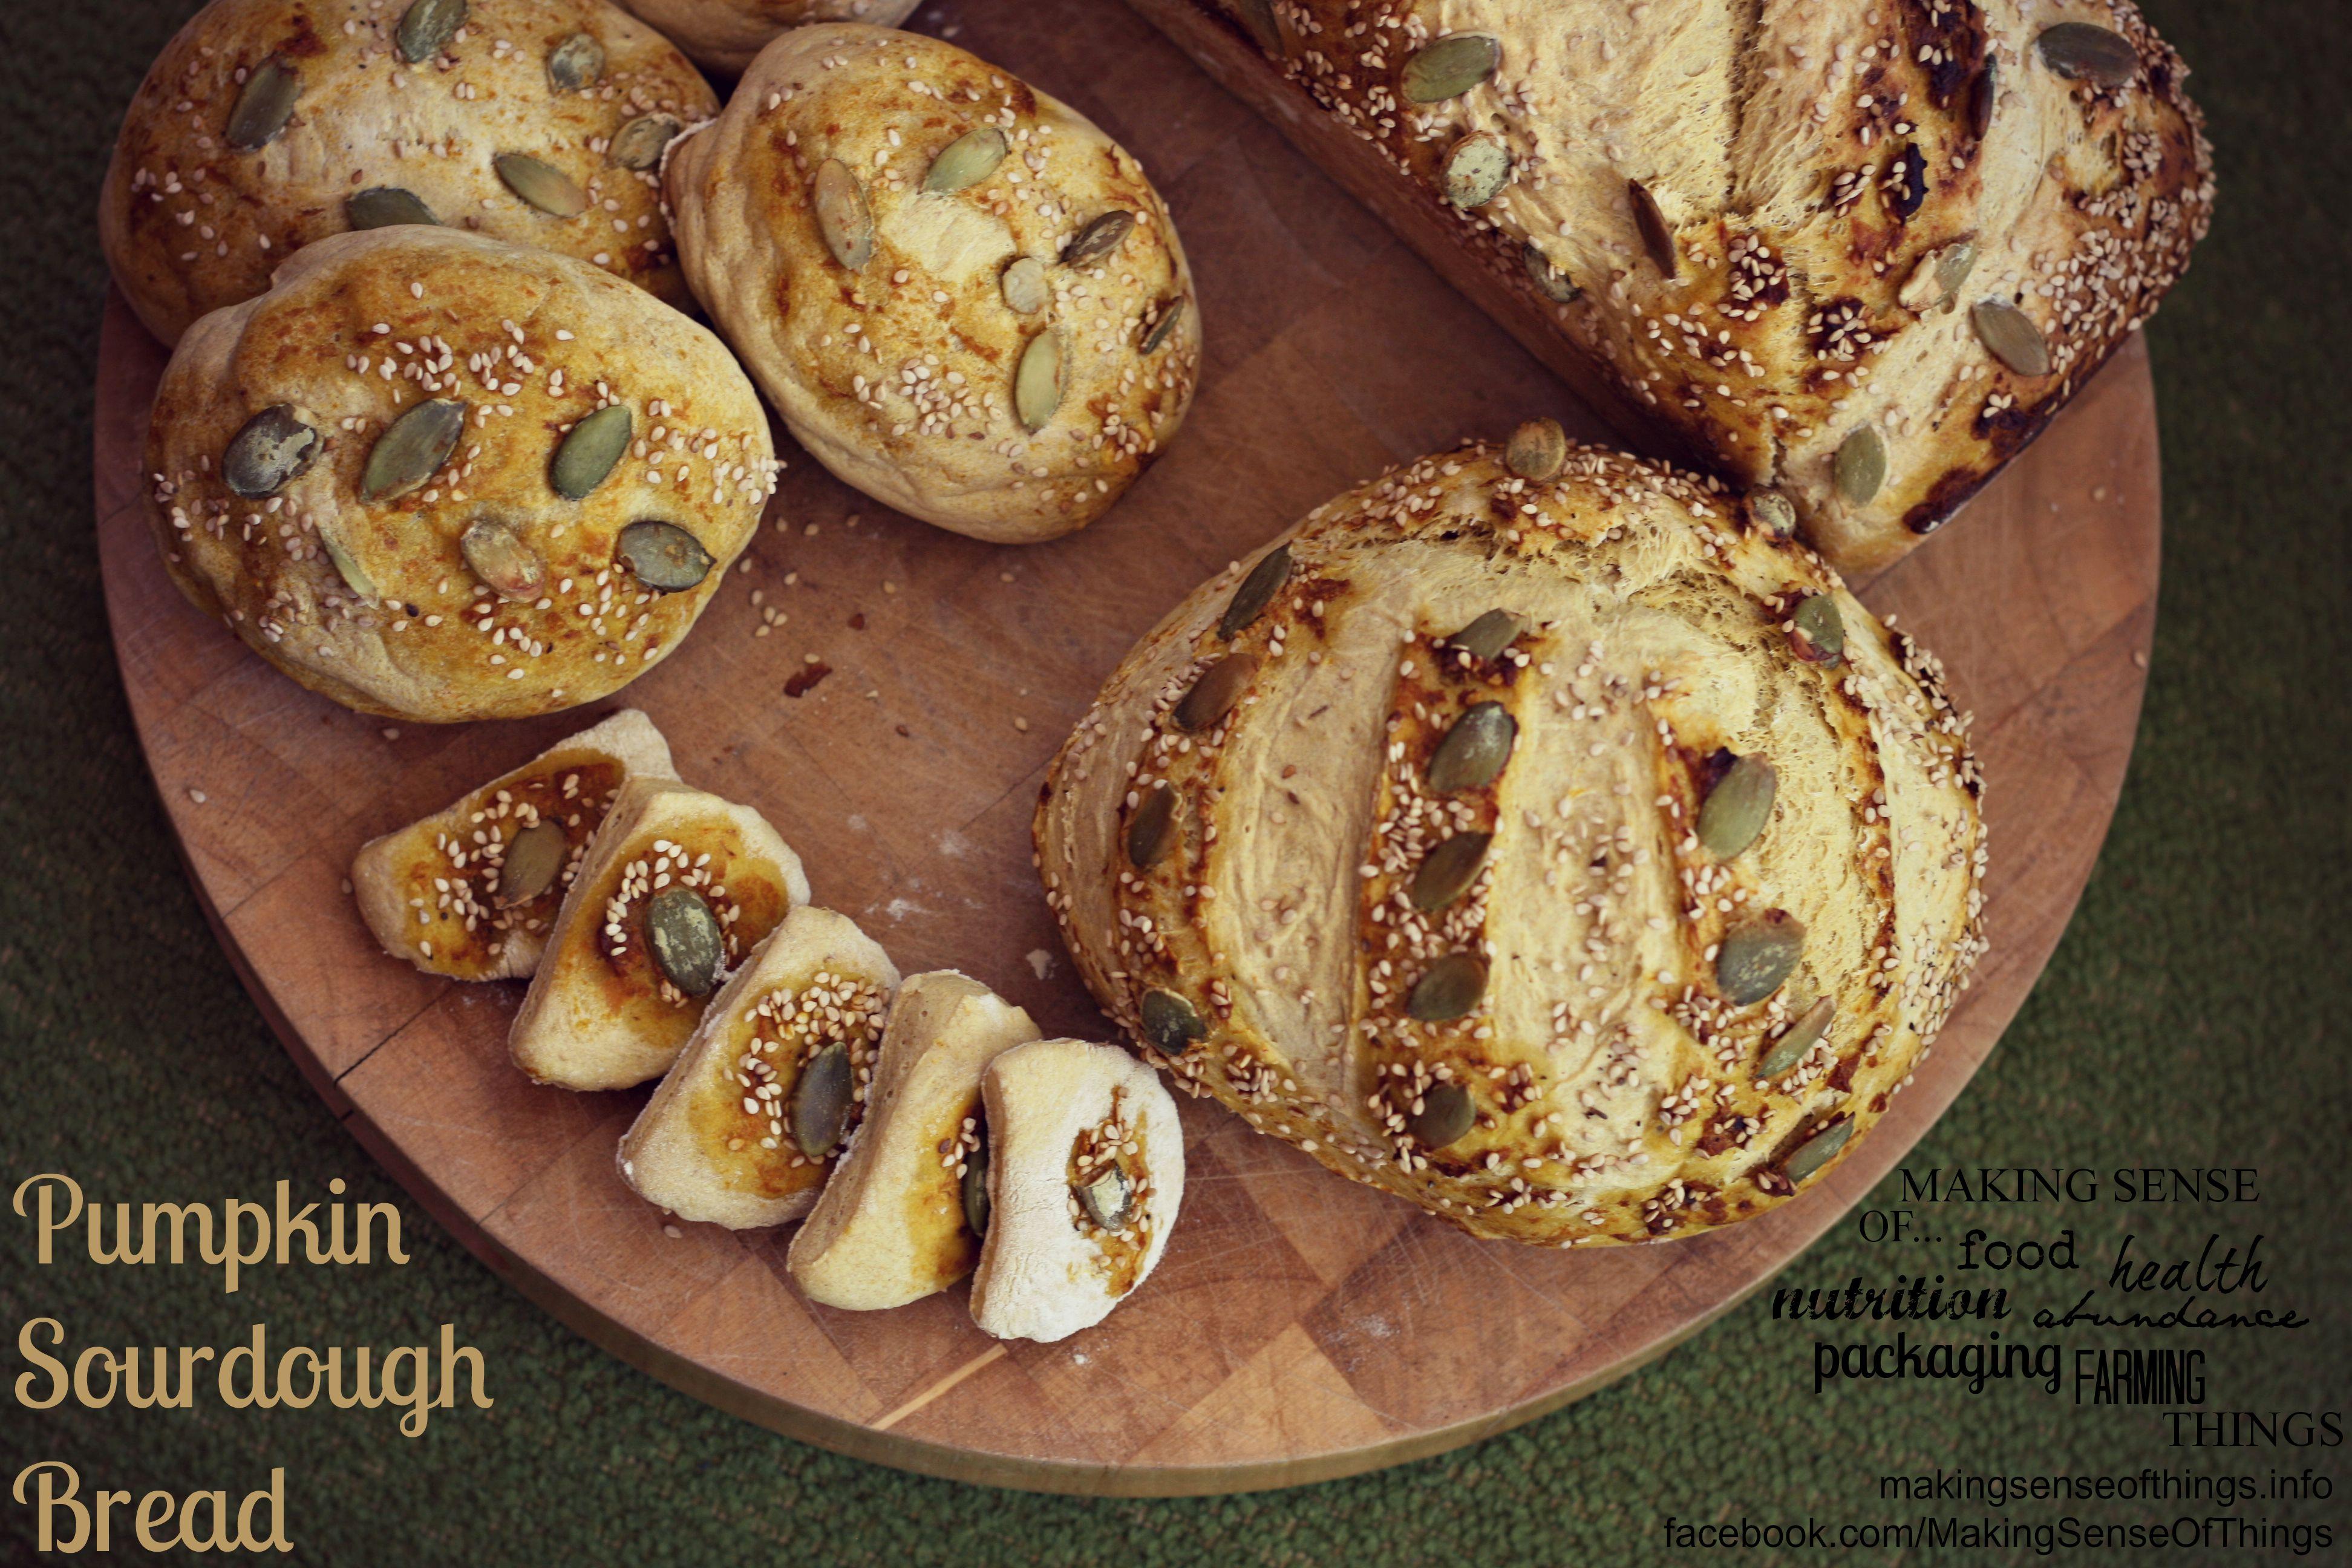 Pumpkin Sourdough Bread, recipe here: https://www.facebook.com/photo.php?fbid=589195237807822&set=a.405384189522262.97578.123763421017675&type=1&theater